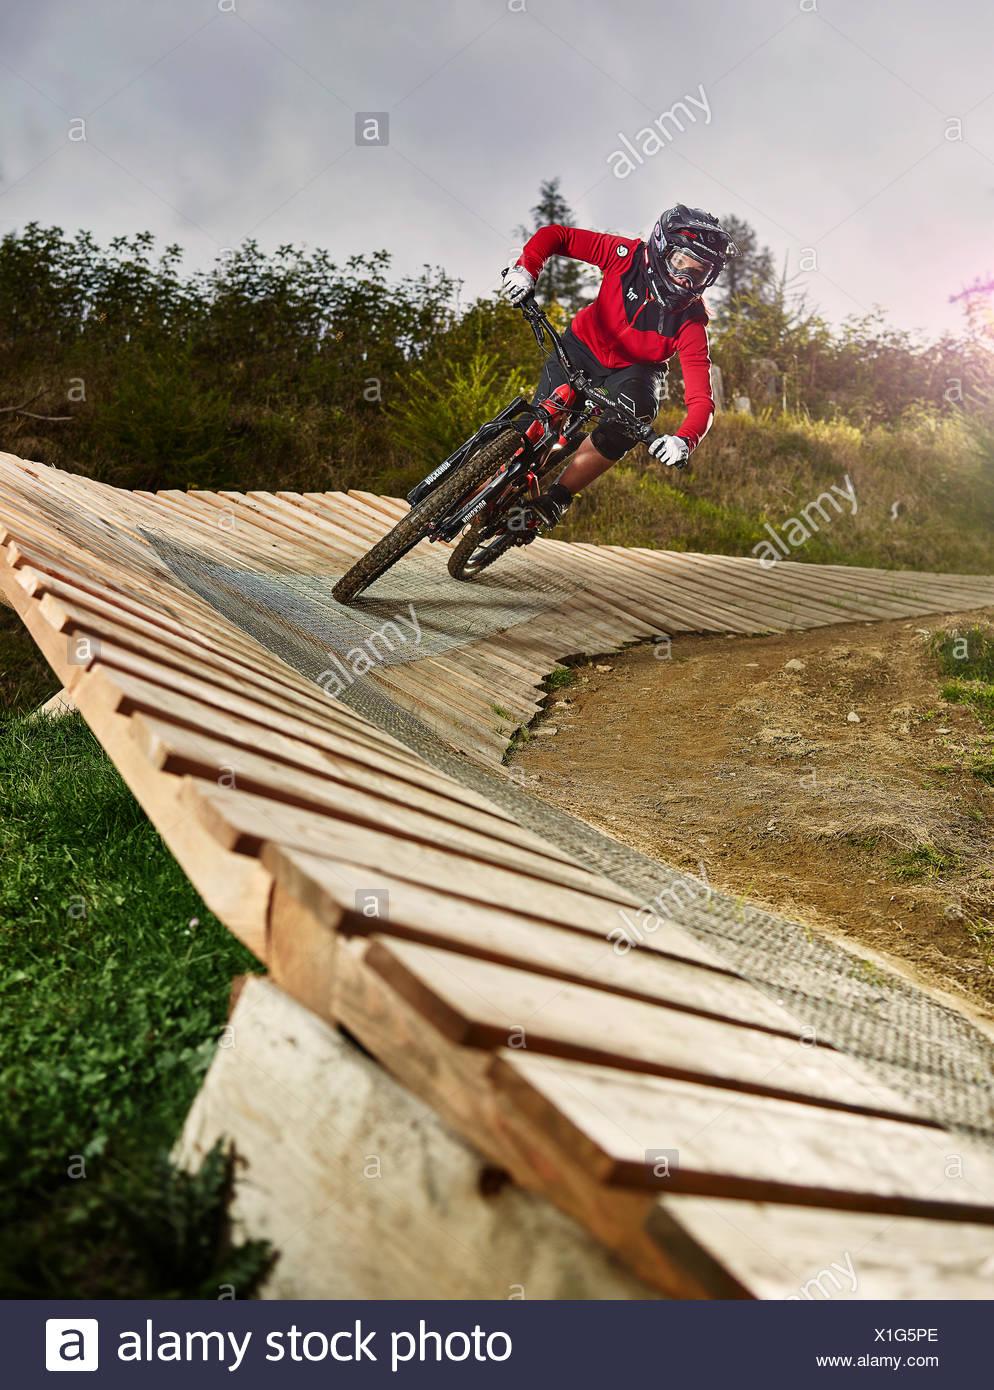 Mountain Biker, downhill biker in sella lungo una rampa in una curva ripida su un sentiero in discesa, Mutterer Alm, Muttereralmpark, Mutters Foto Stock